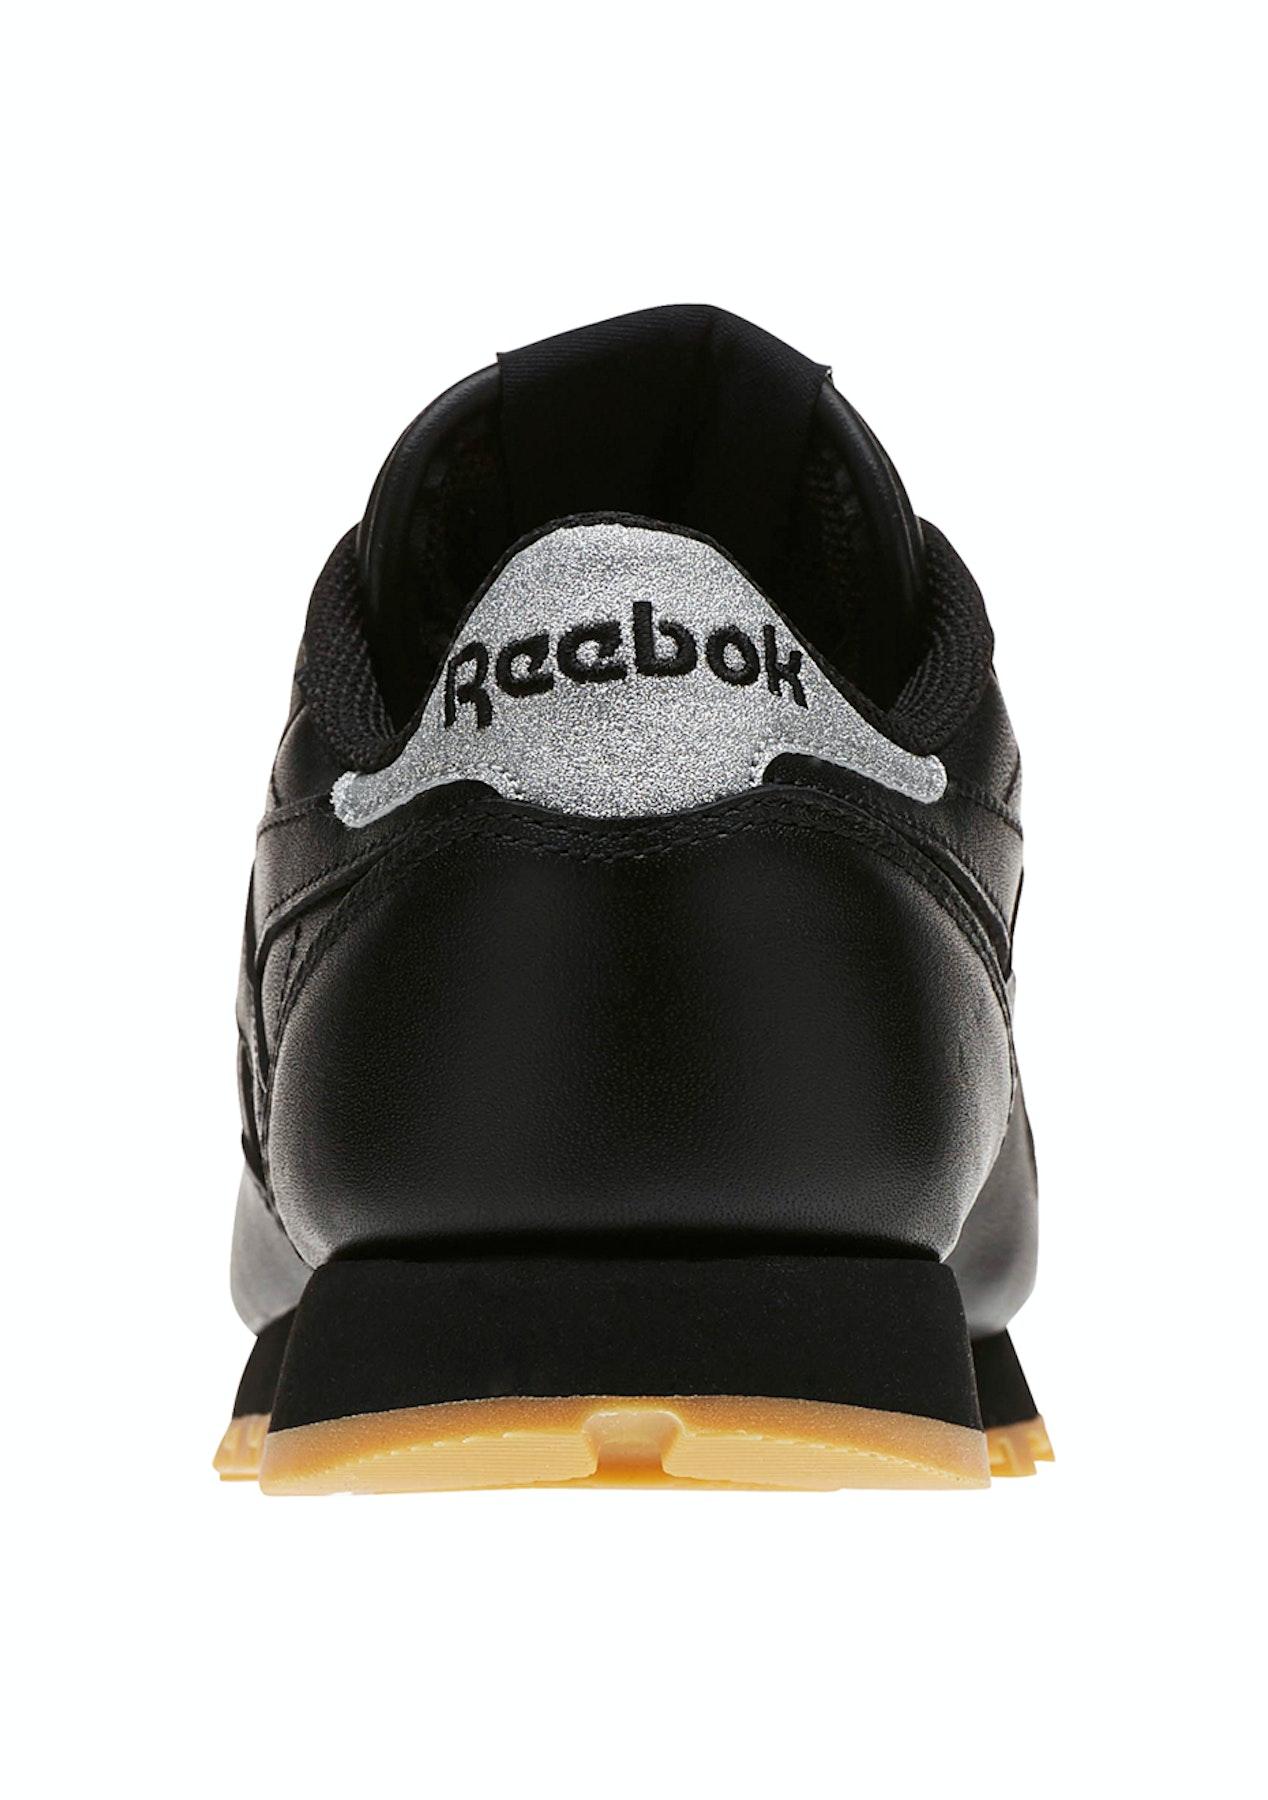 258481d496c7 Reebok Womens - Classic Leather Met Diamond Black Gum - Shoe Warehouse -  Onceit